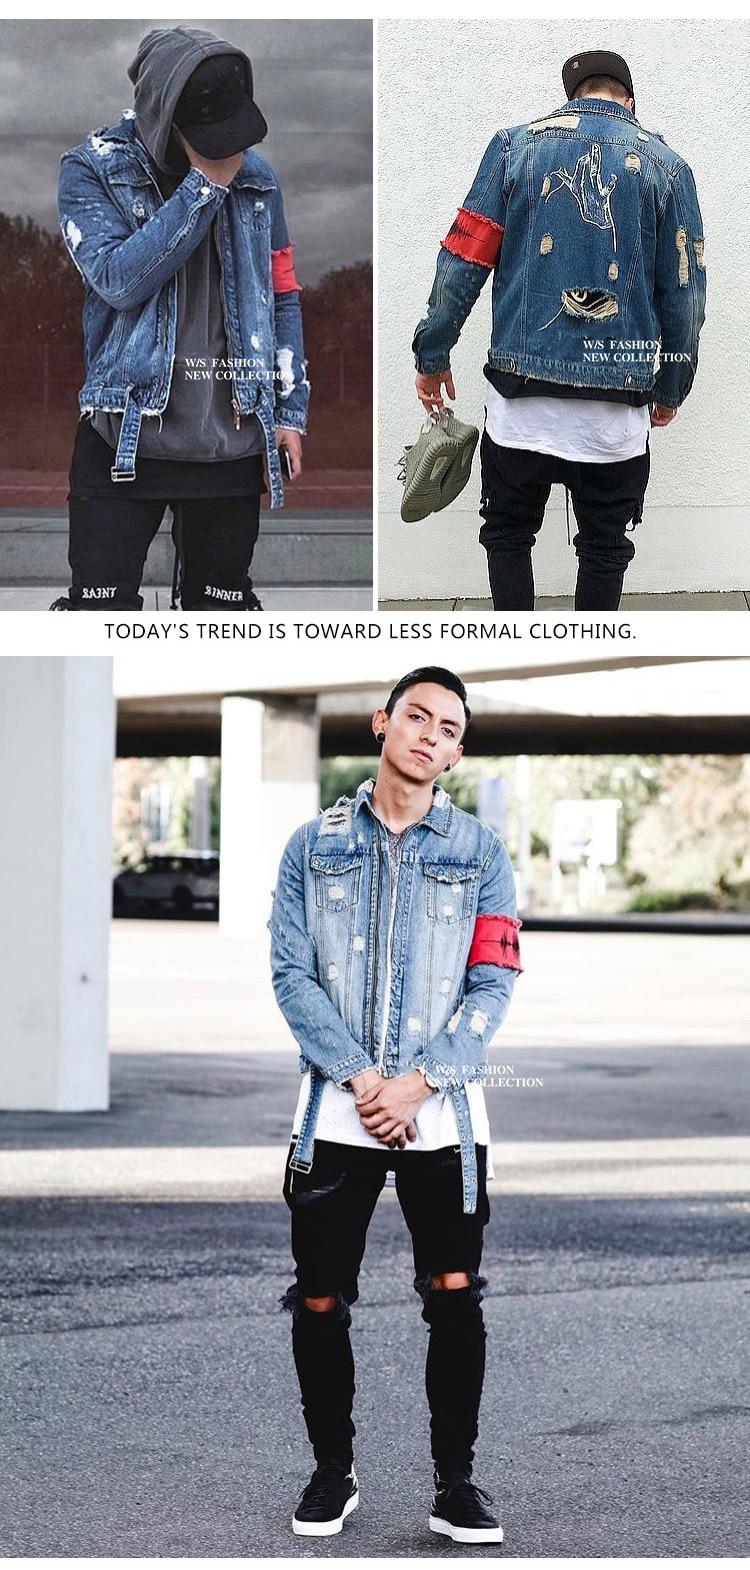 HTB1jm3abeL2gK0jSZFmq6A7iXXaE Men's Jean Jackets Streetwear Hip Hop Bomber Jacket Denim Jacket Men Brand Ripped Denim Jackets Casual Fashion Coat